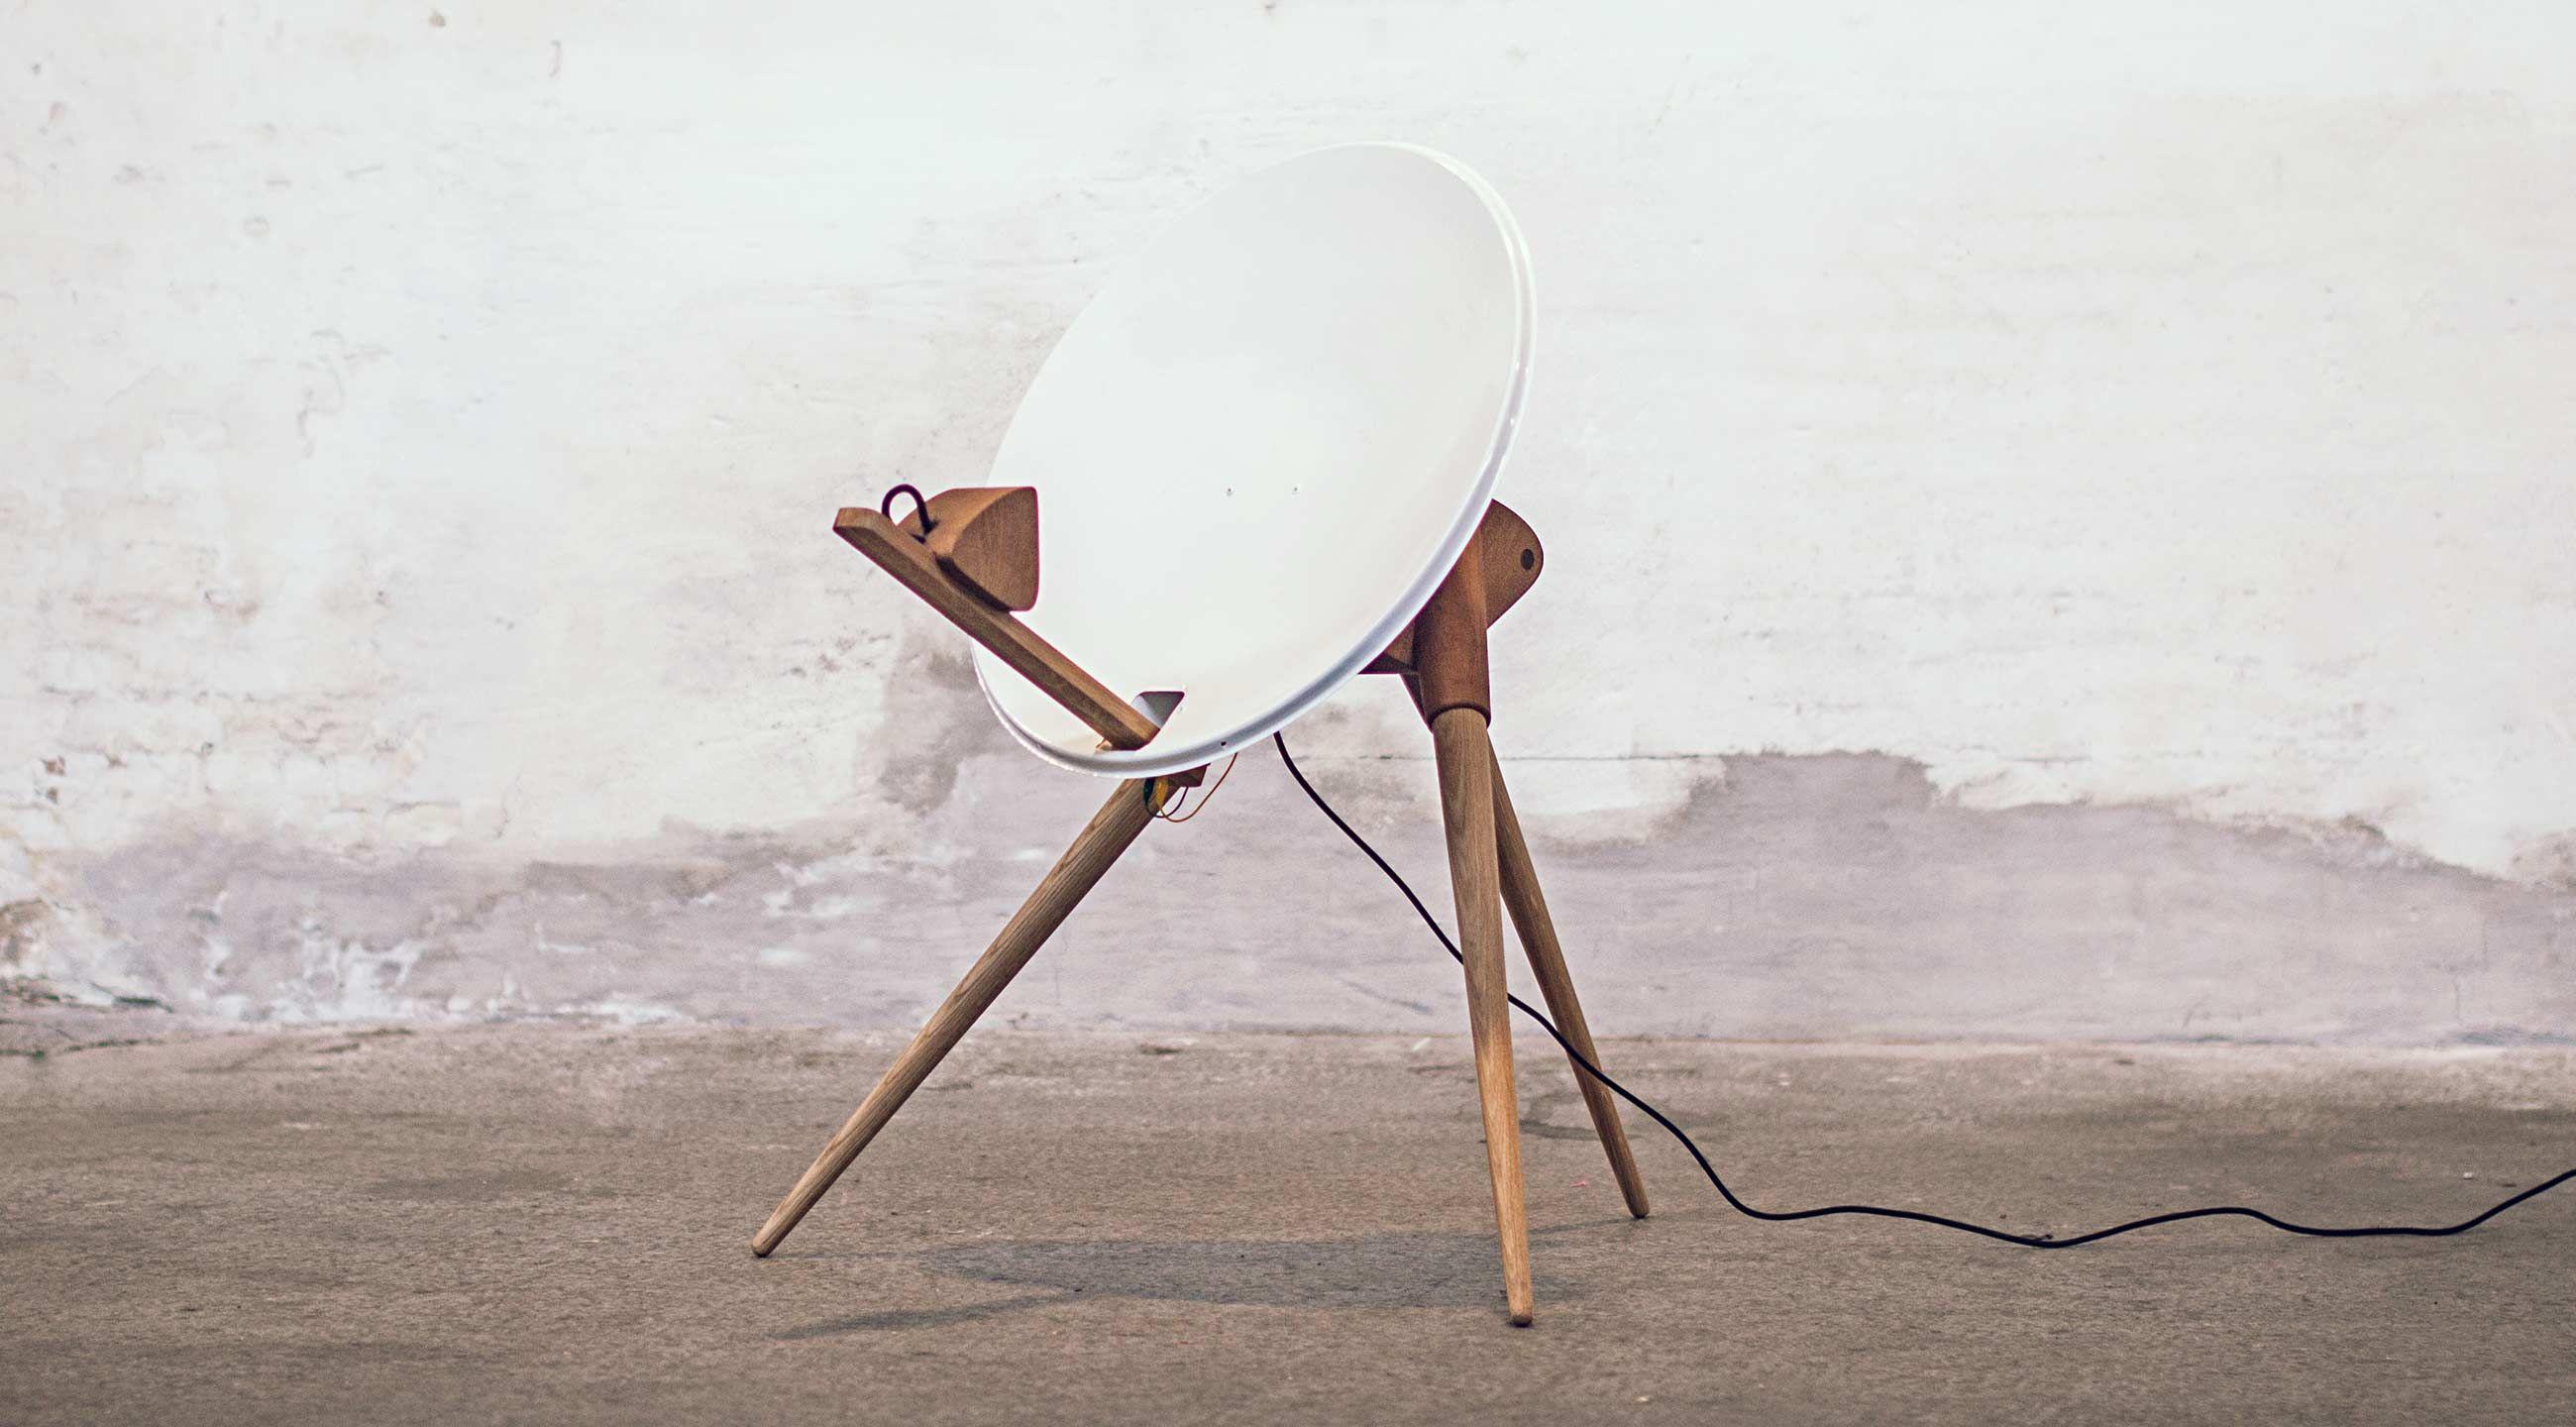 Reflektor - Brugt parabol. Indirekte lys